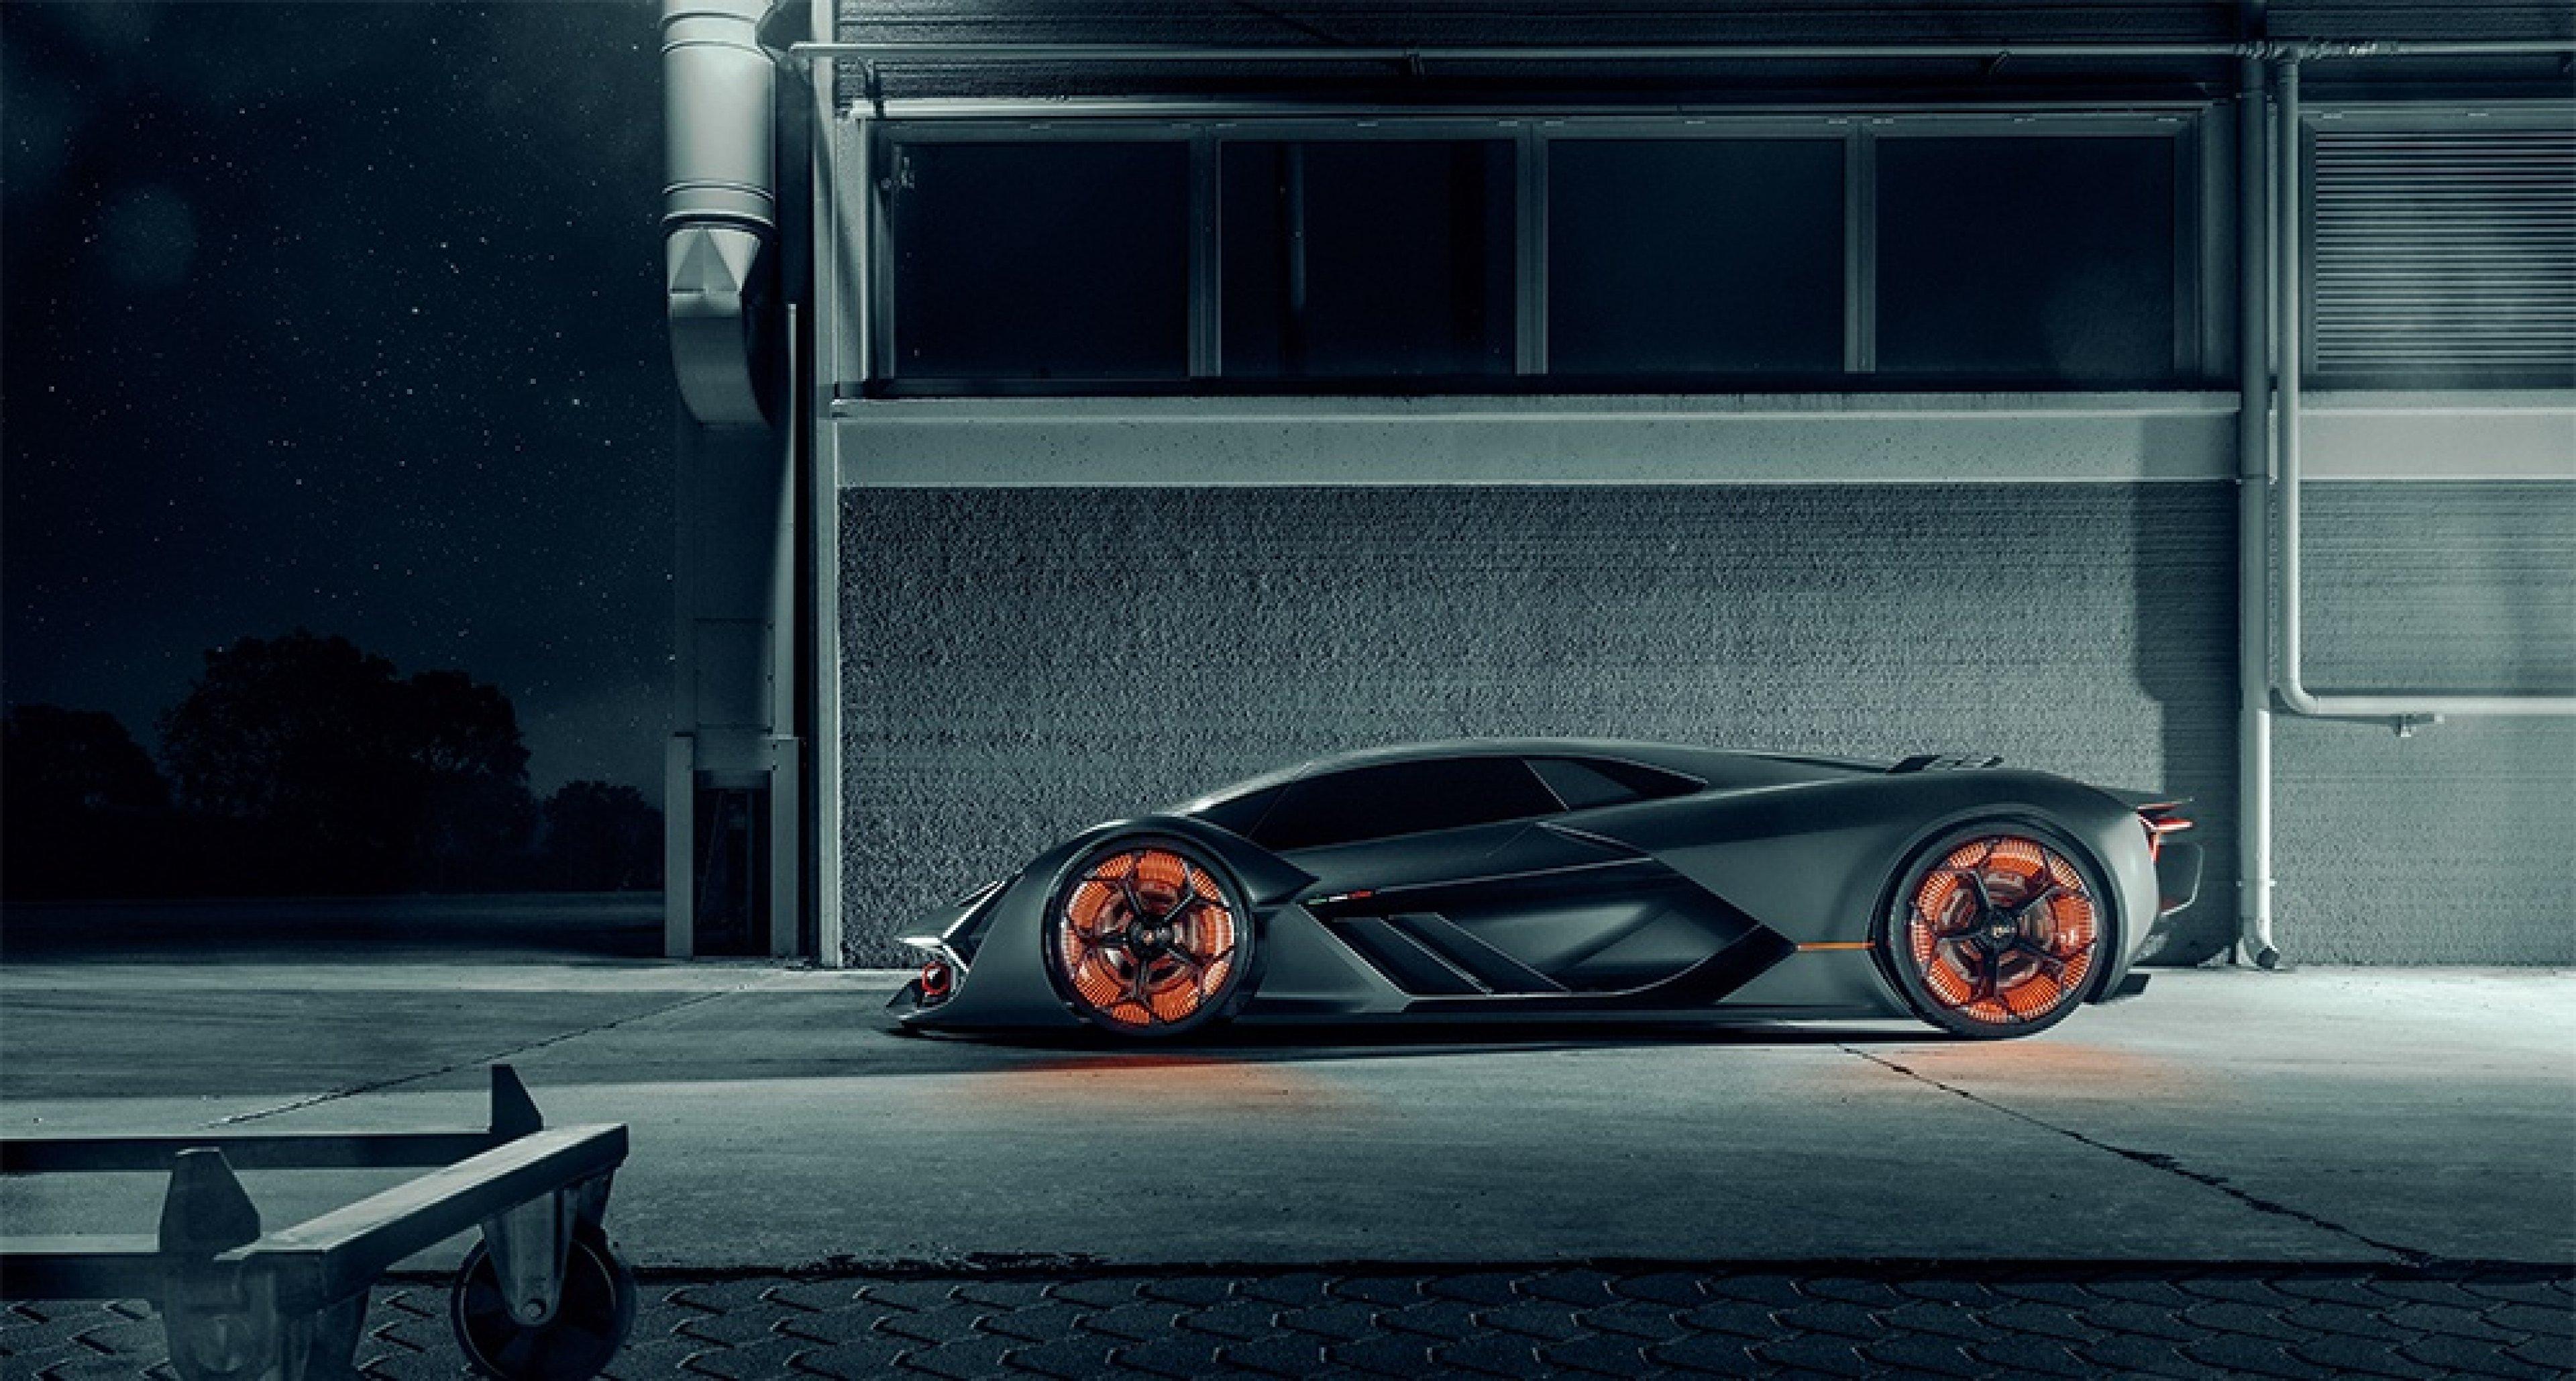 Automobili Lamborghini/Philipp Rupprecht, The Current, gestalten 2018